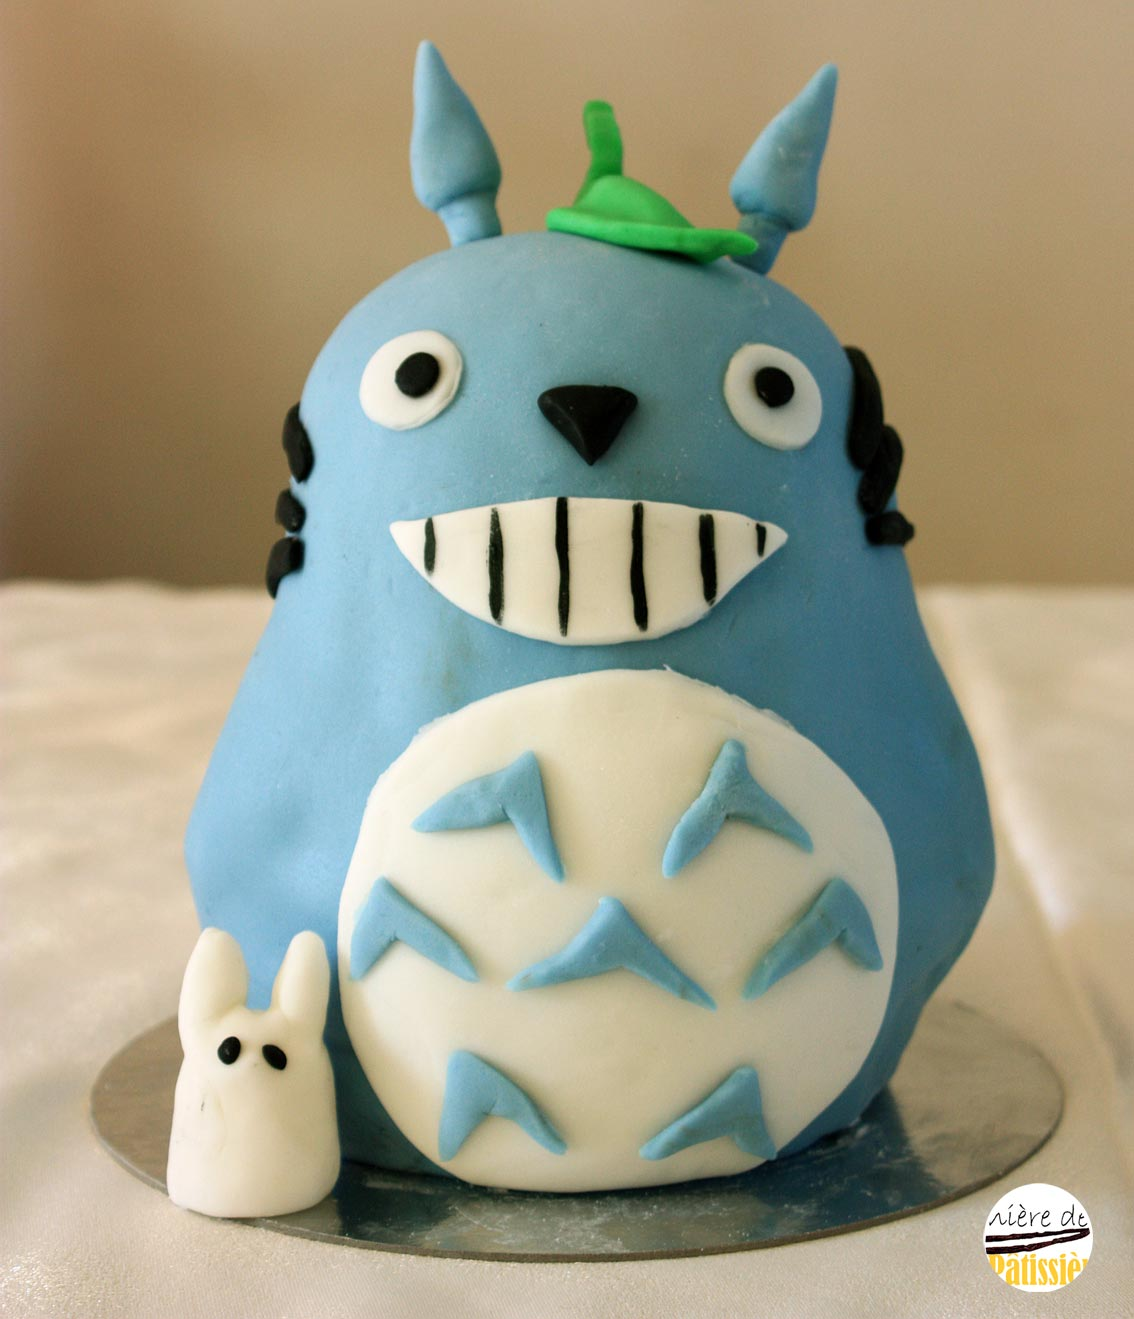 Bien connu Manière de patissière: Geek-cake TOTORO VH85